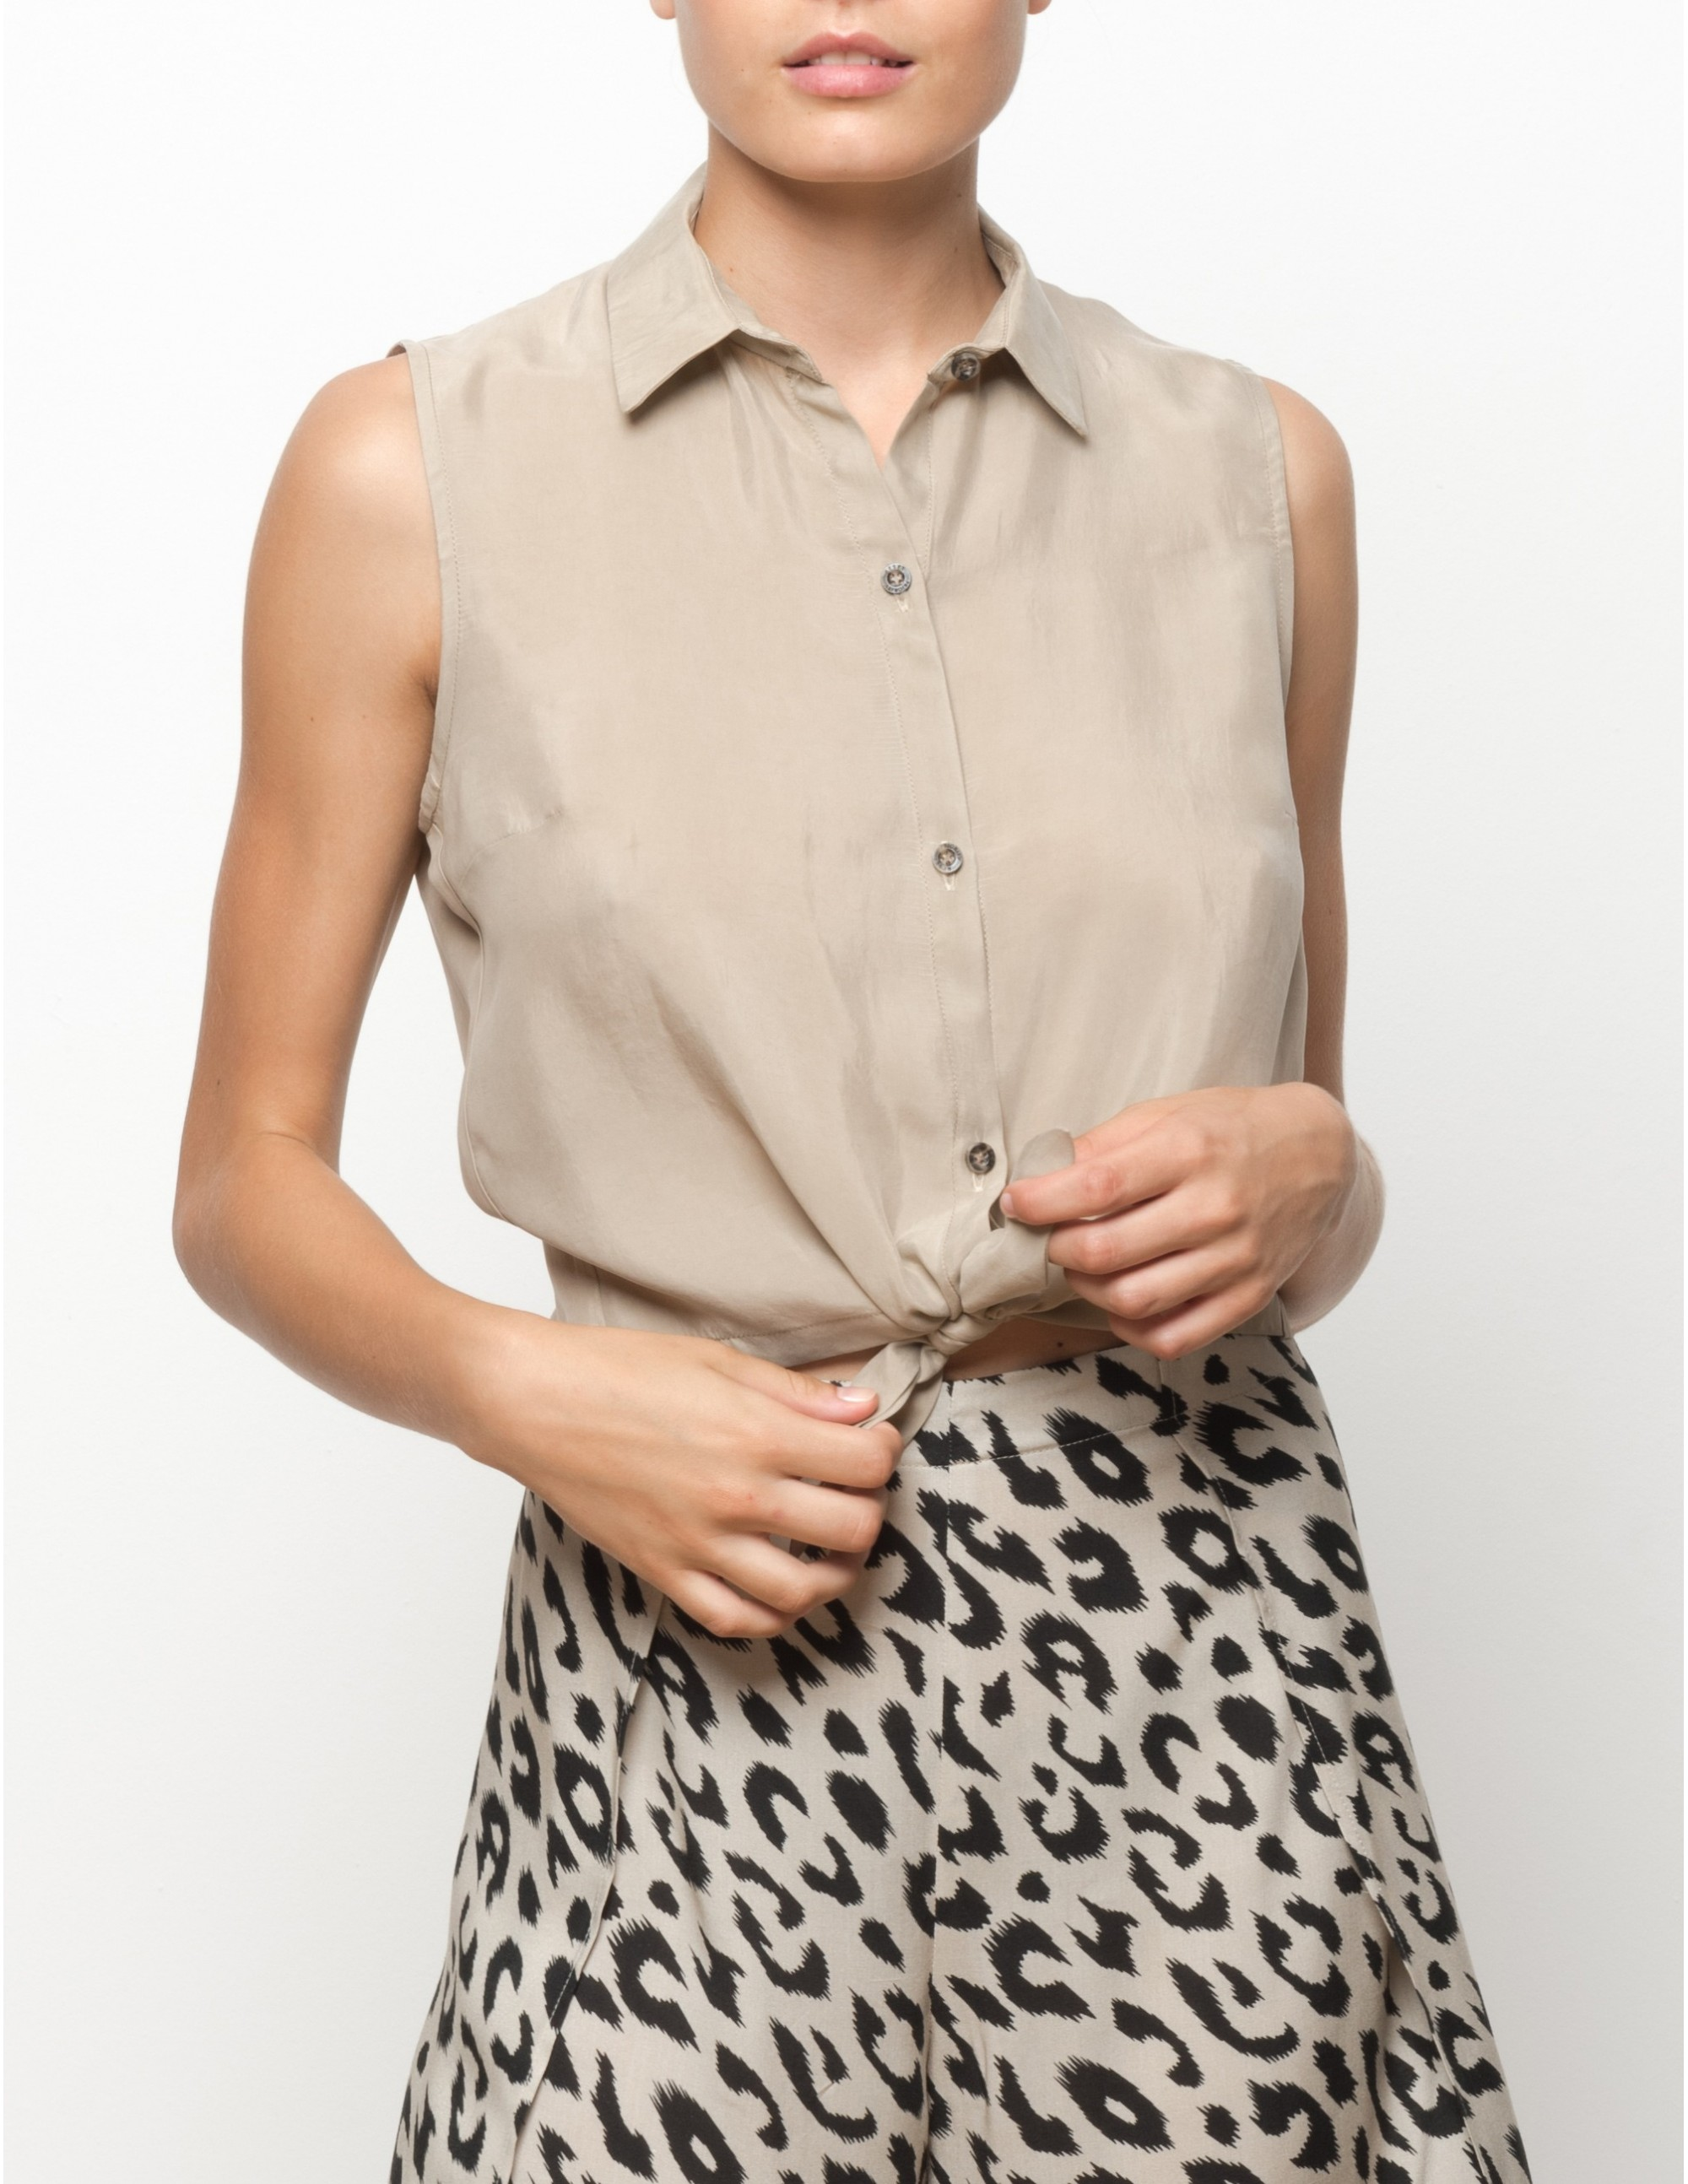 MISALI shirt - TANNED